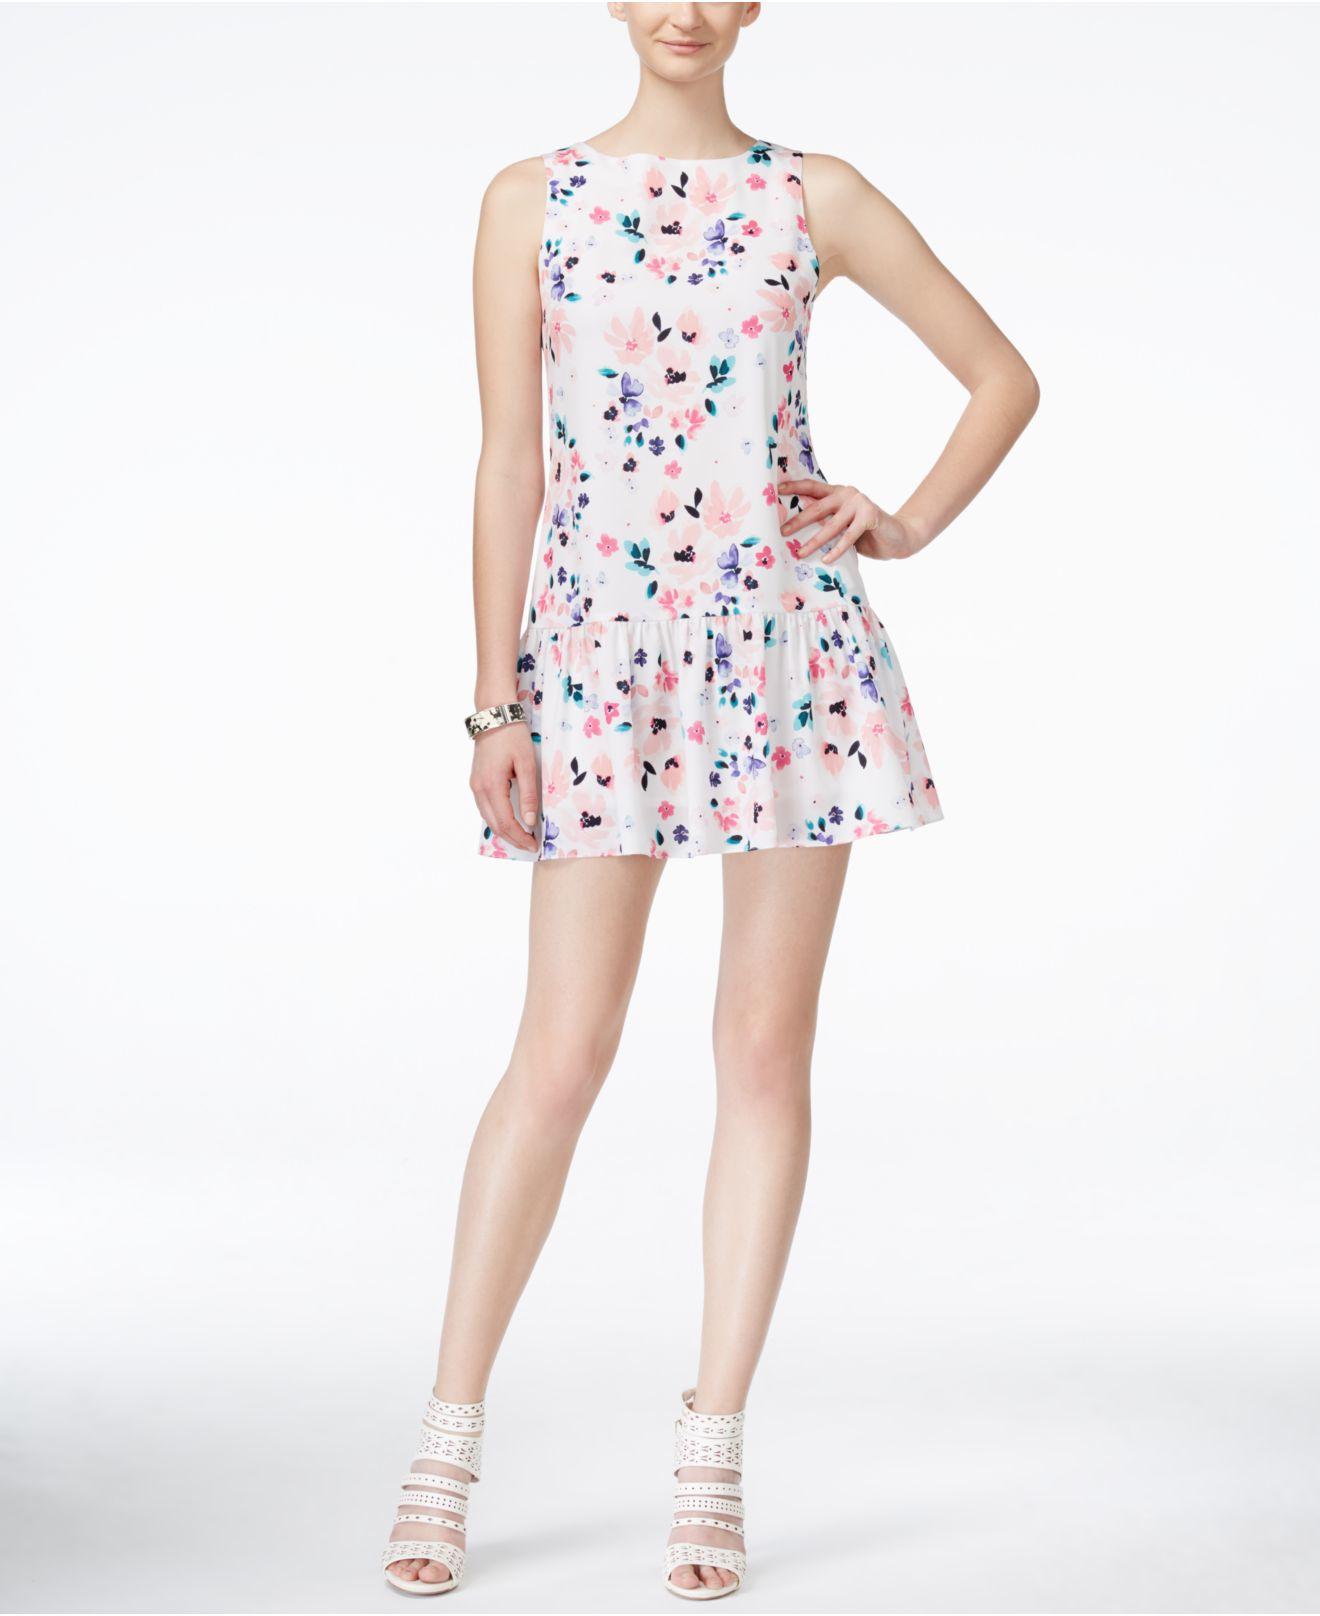 e779ce576a03 Cece by Cynthia Steffe Cece Floral-print Drop-waist Dress - Lyst